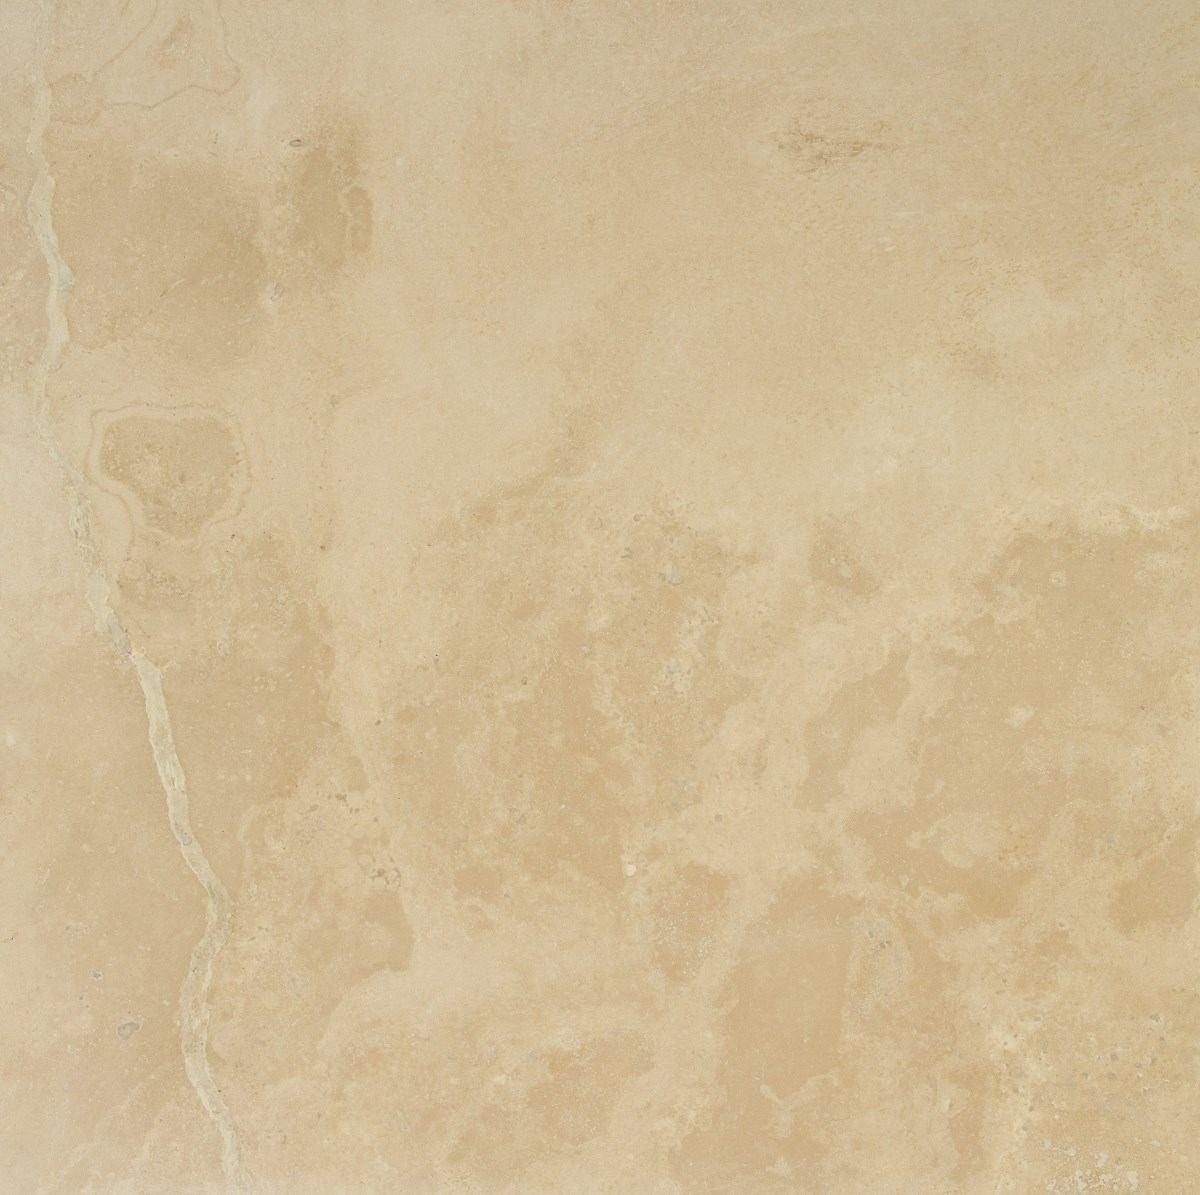 piso de marmol travertino 30x30 veracruz pulido mate beige